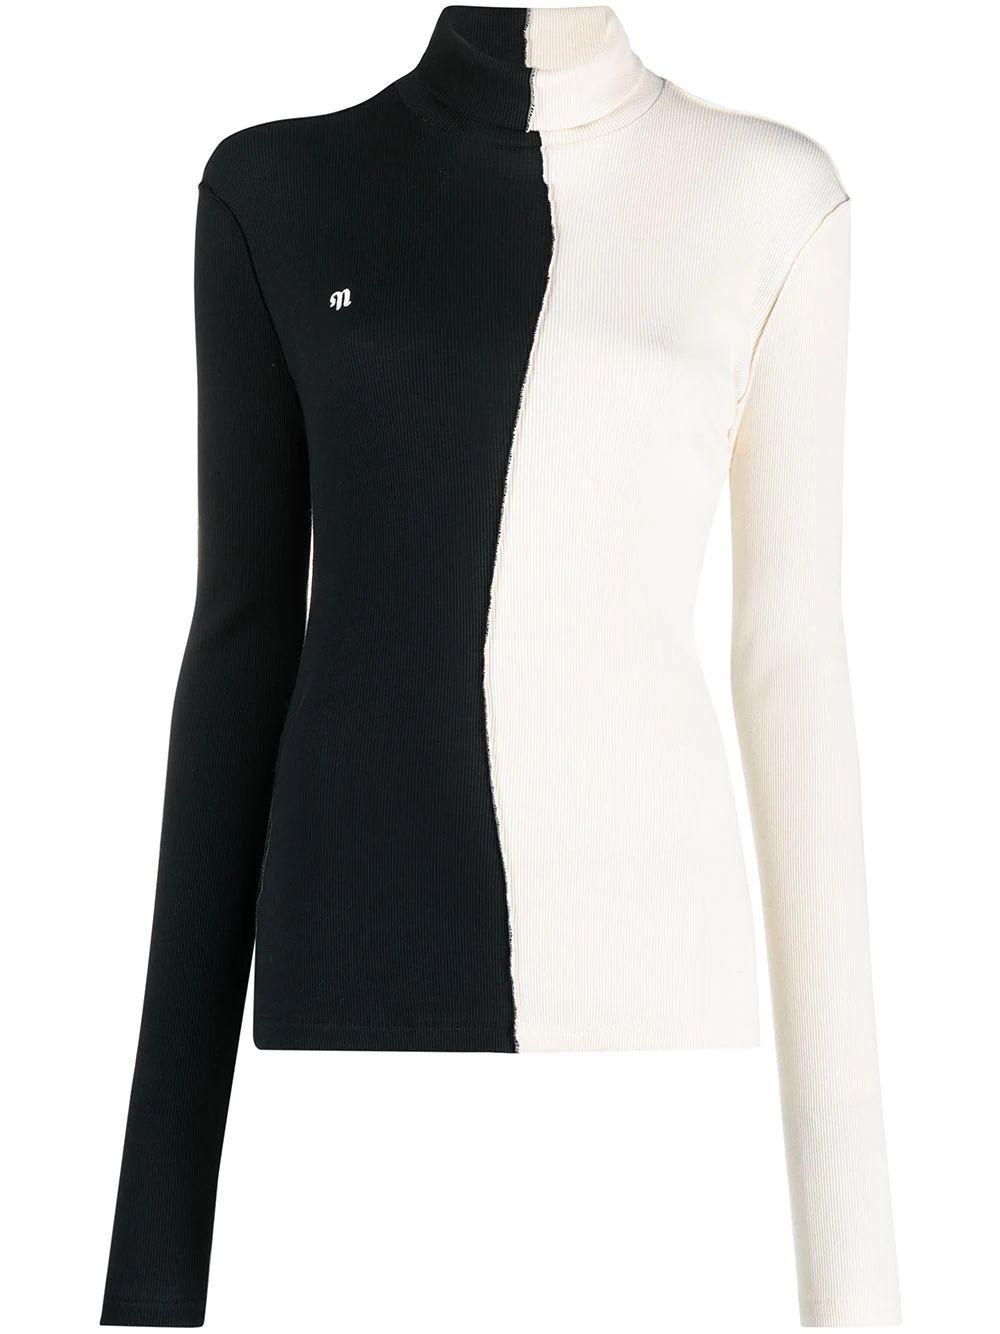 Villa Patchwork Turtleneck Sweater Item # NW21PFTP01899